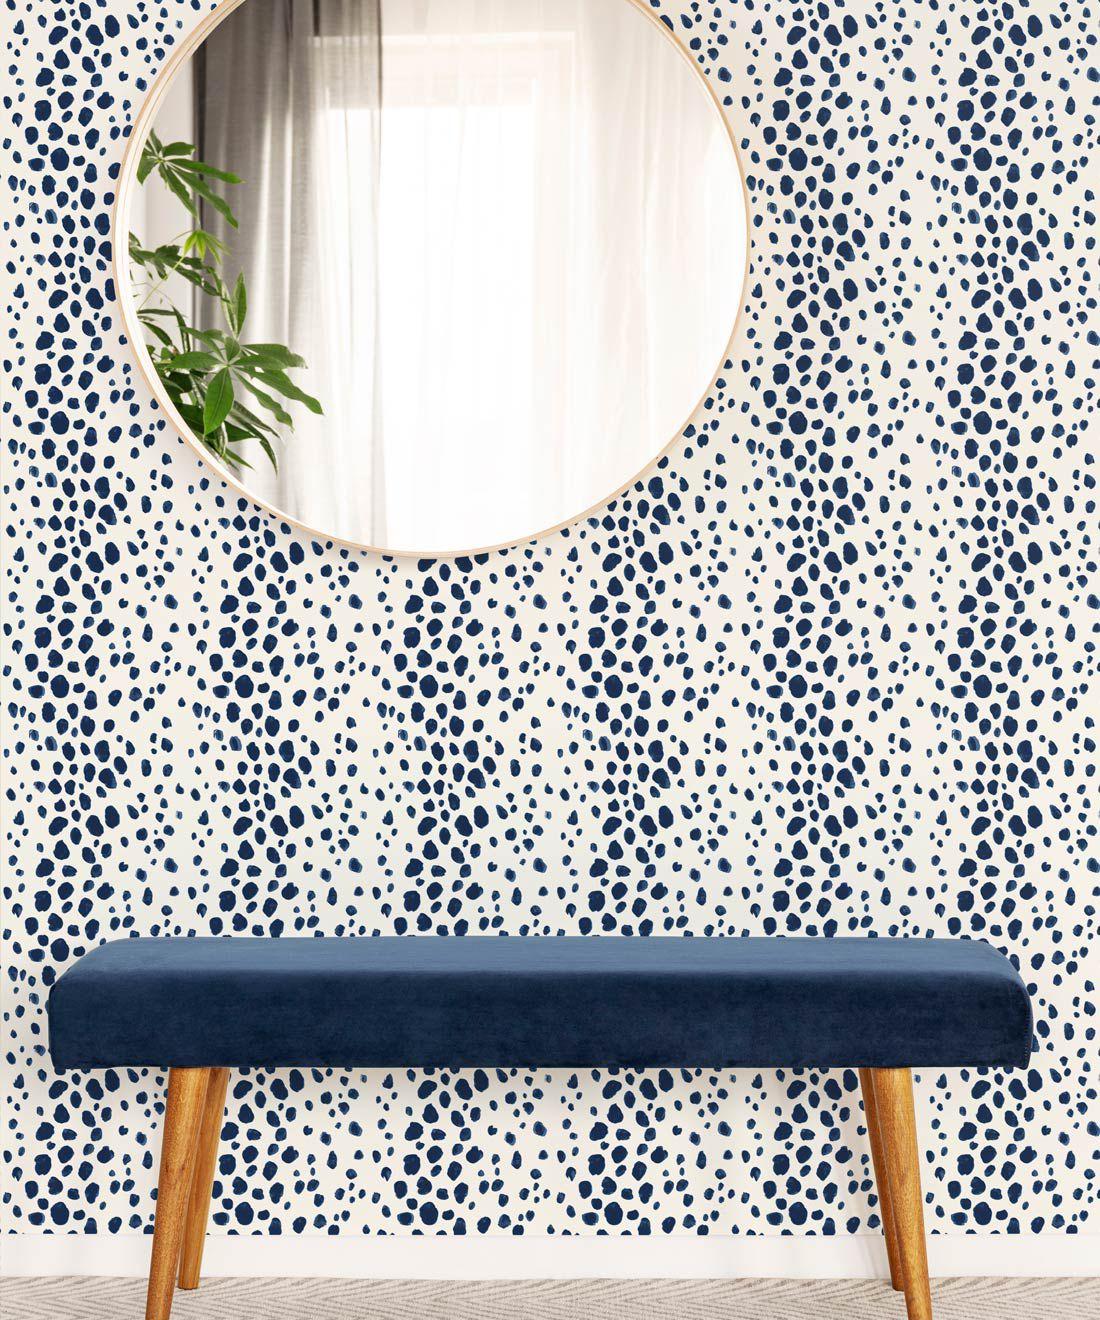 Park Avenue Wallpaper • Dianne Bergeron • Animal Print Wallpaper • Animal Spots Wallpaper • Indigo • Insitu